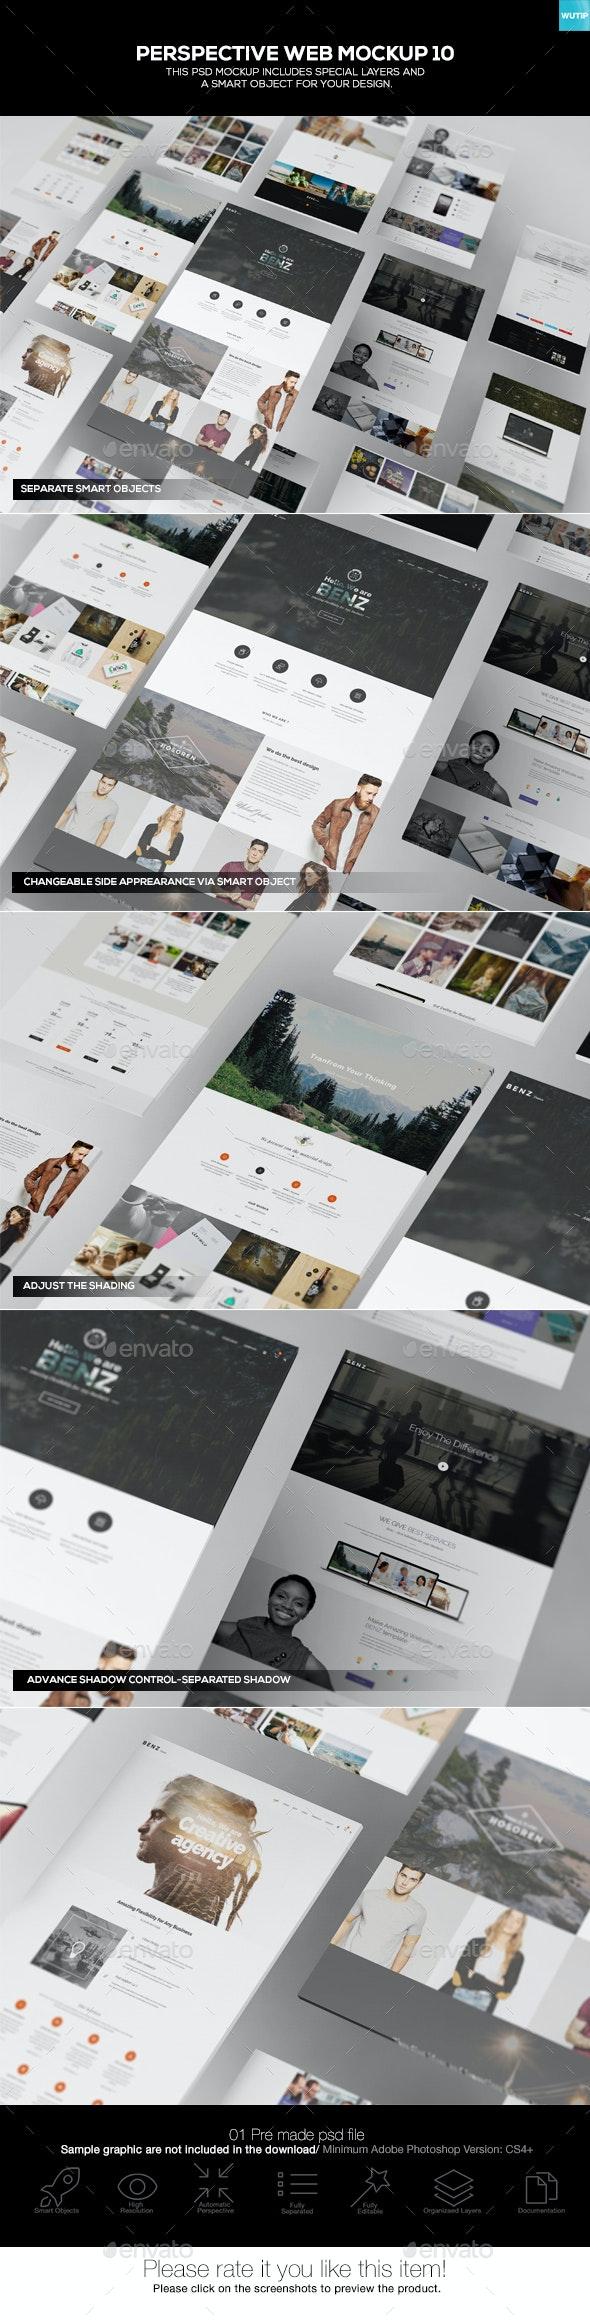 Perspective Web Mockup 10 - Website Displays